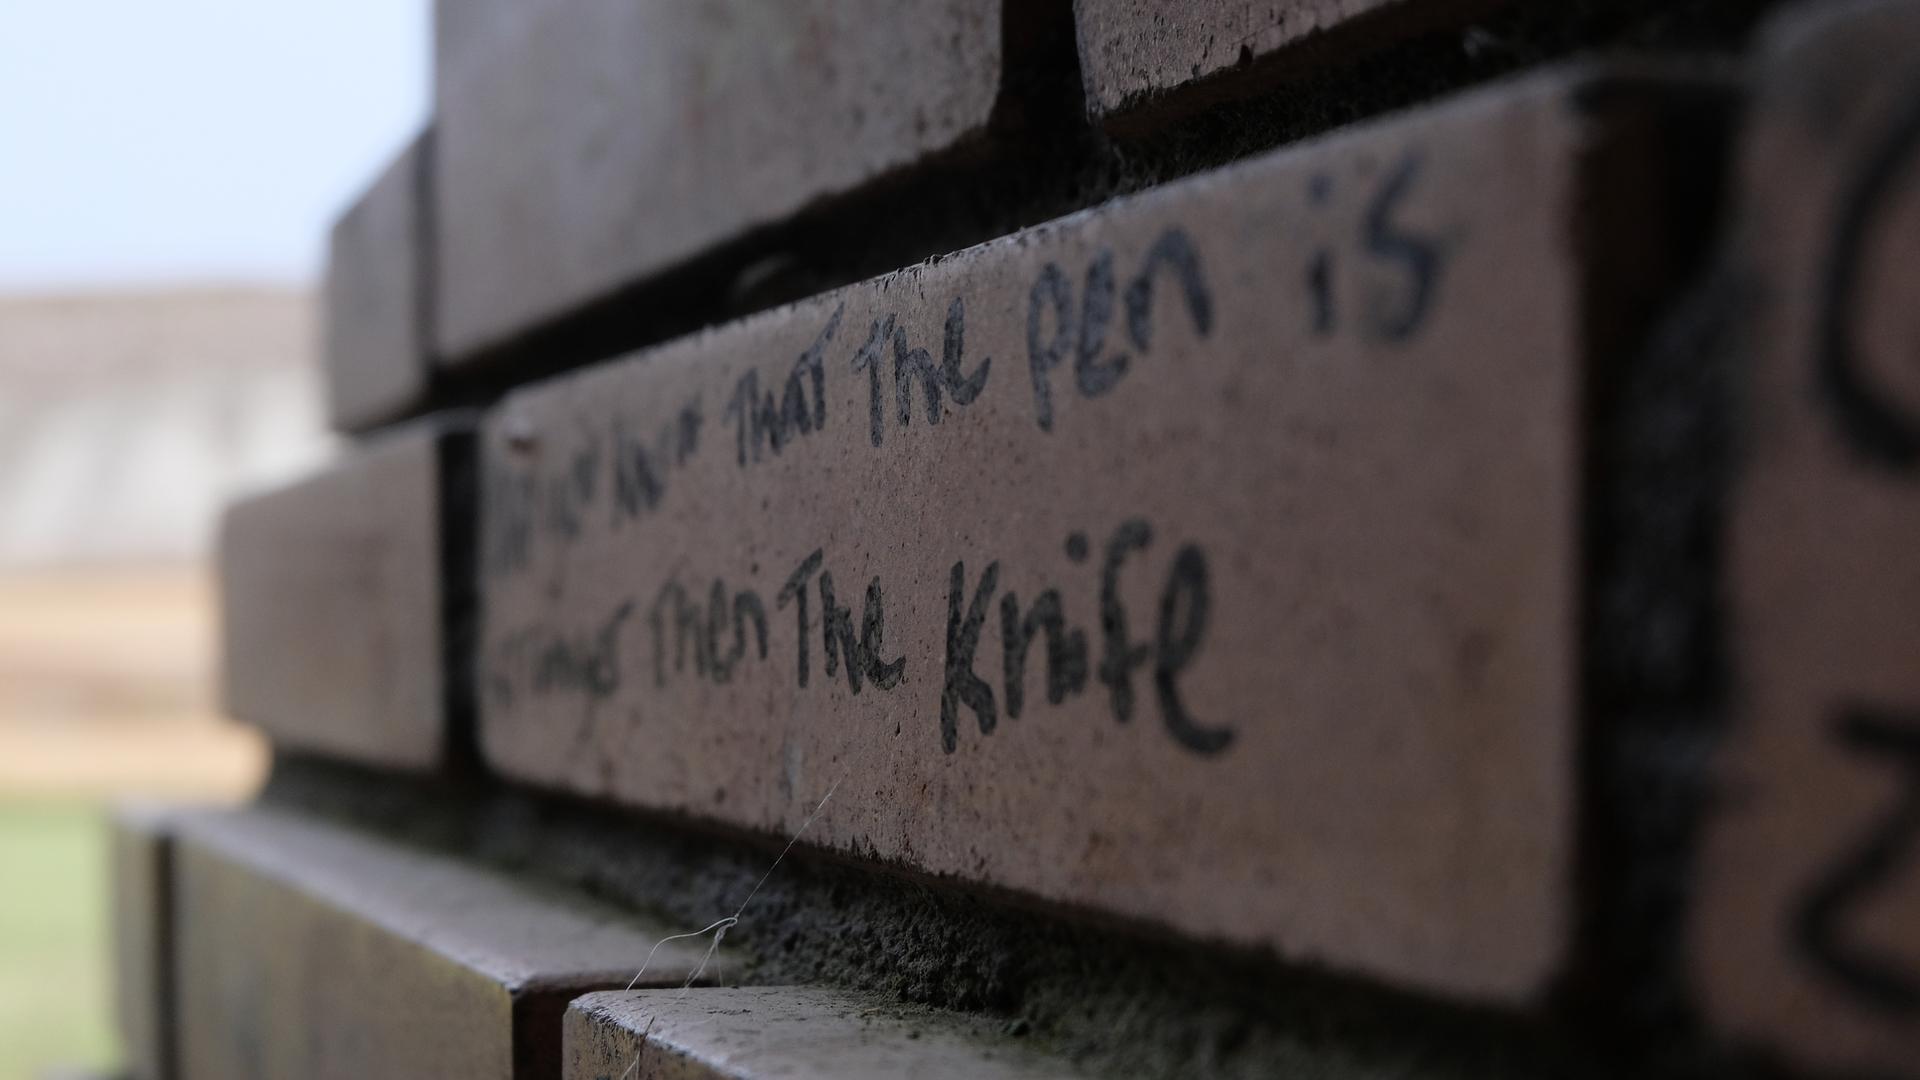 Pen>Knife 1920x1080